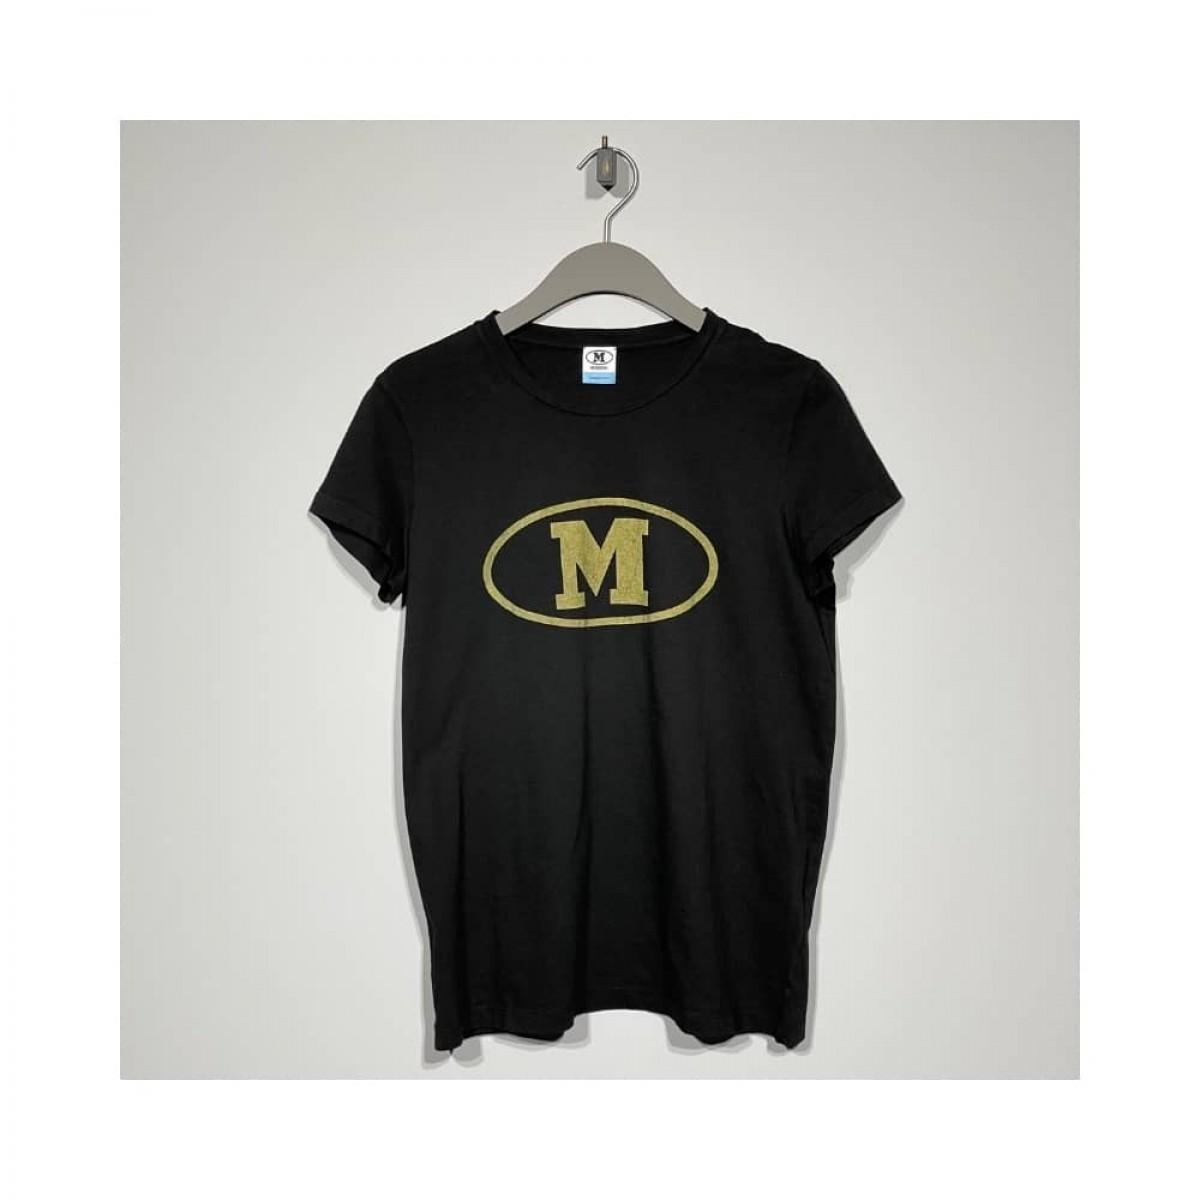 m missoni t-shirt - black